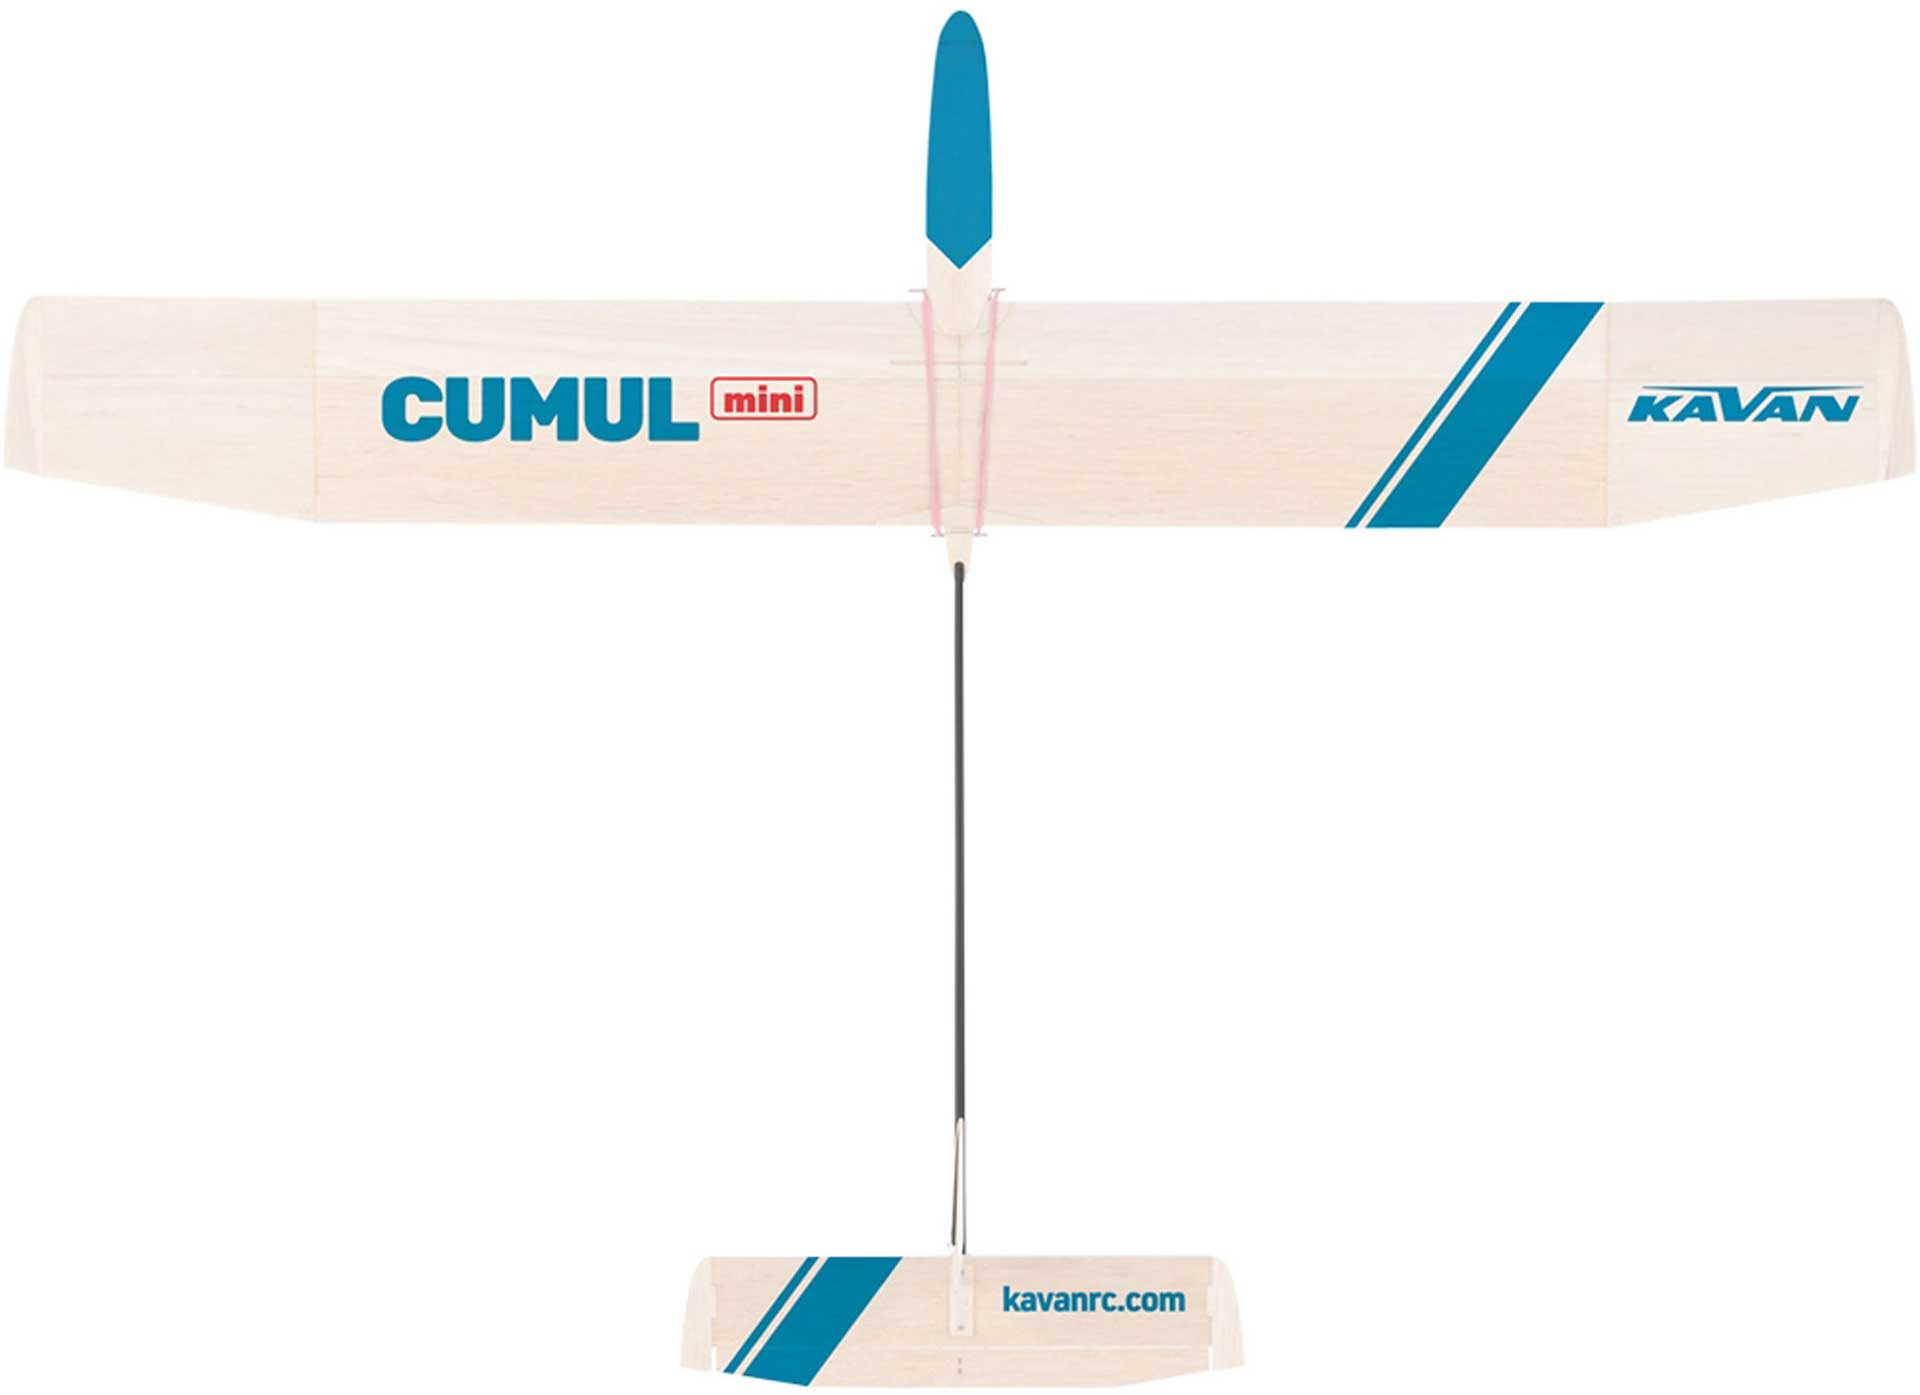 KAVAN CUMUL mini Segler 1130mm Freiflugmodell